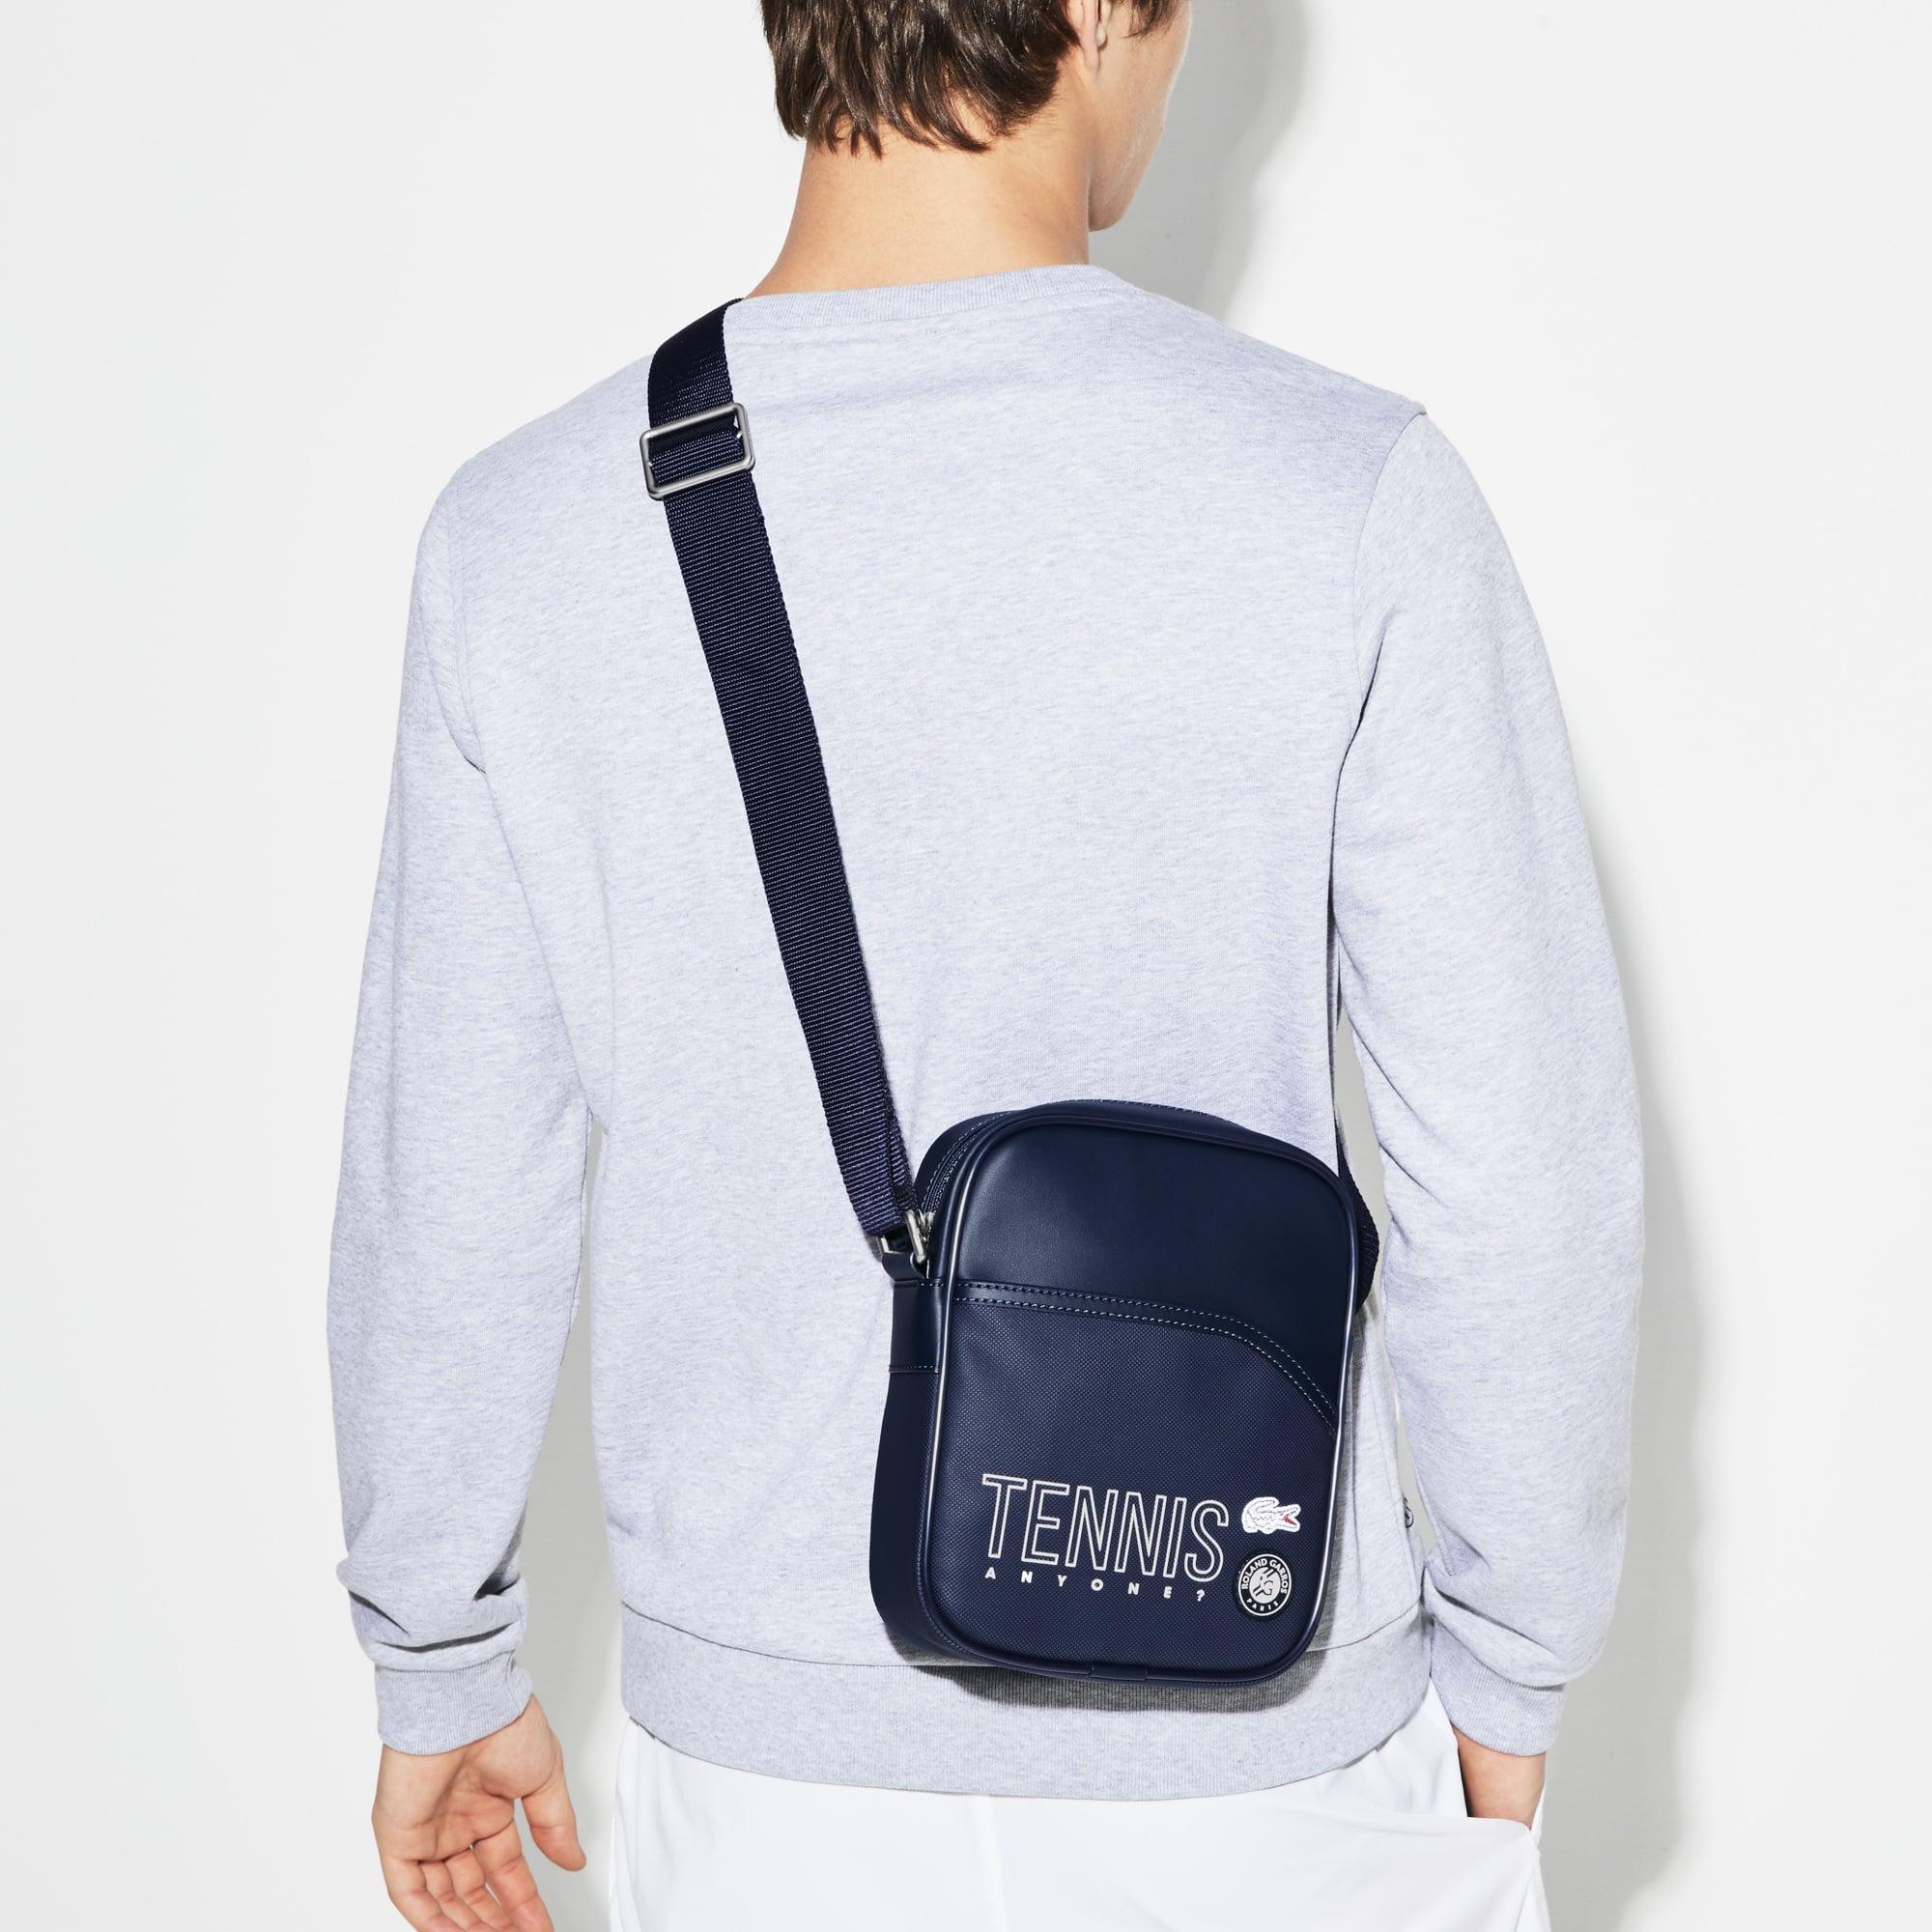 Men's Lacoste SPORT Roland Garros Lettering Vertical Bag